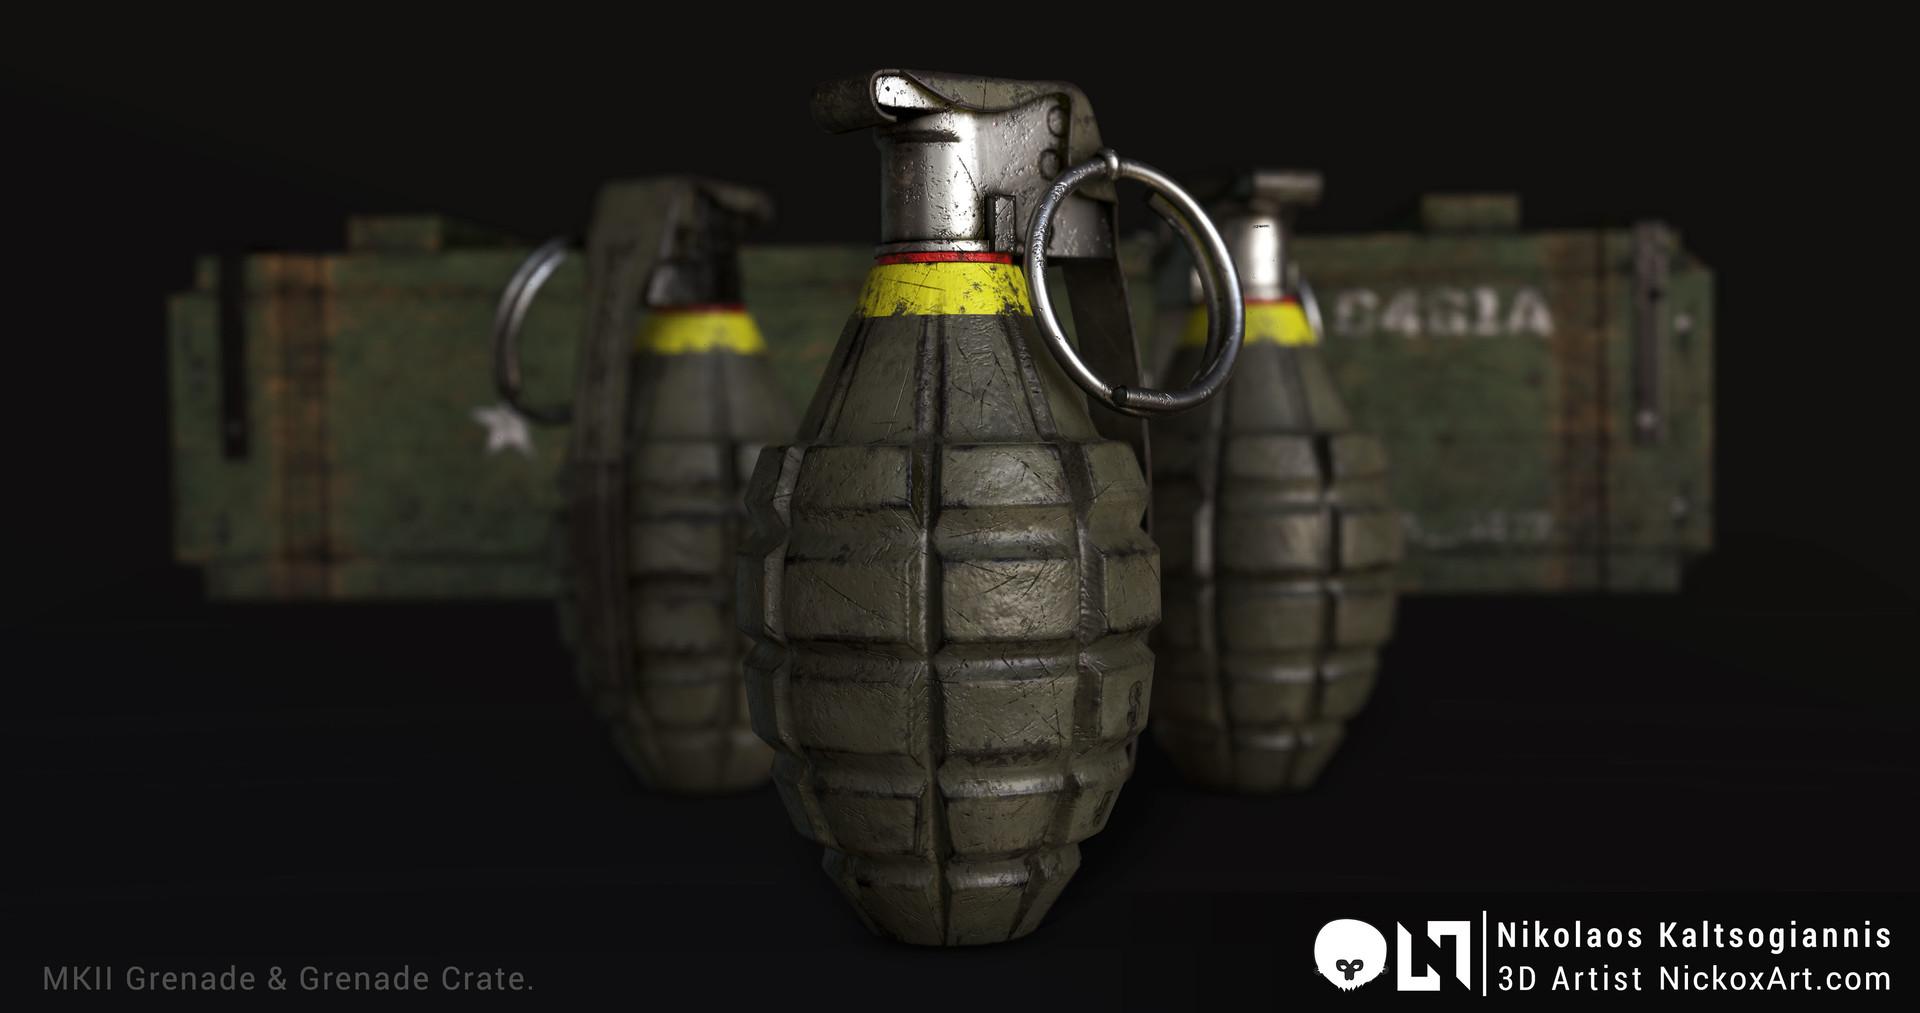 MKII Grenade & Grenade Crate.